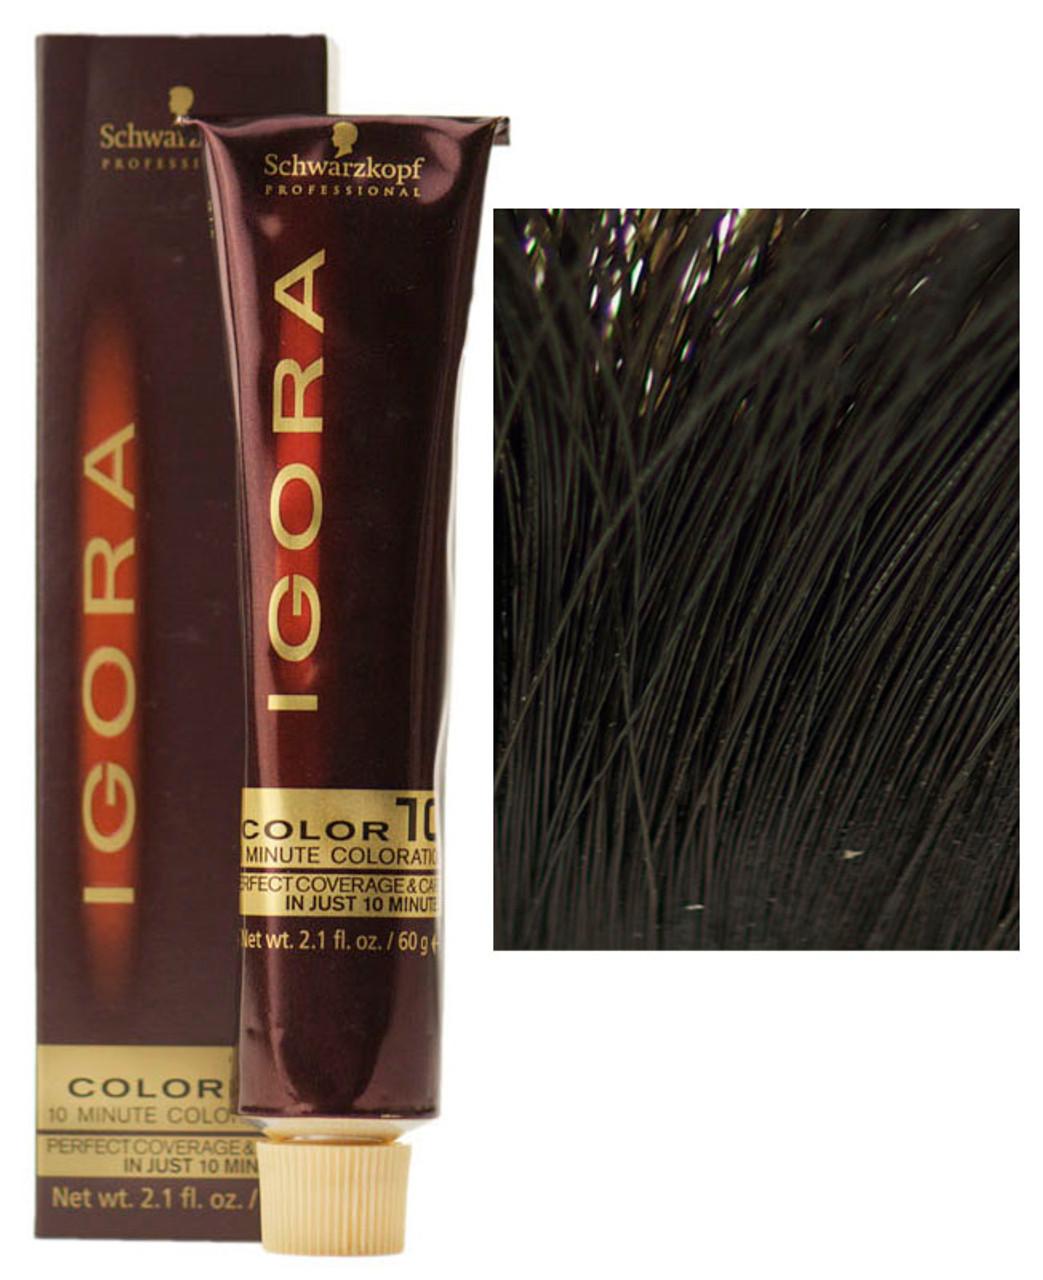 Schwarzkopf Professional Igora Color10 Hair Color Sleekshop